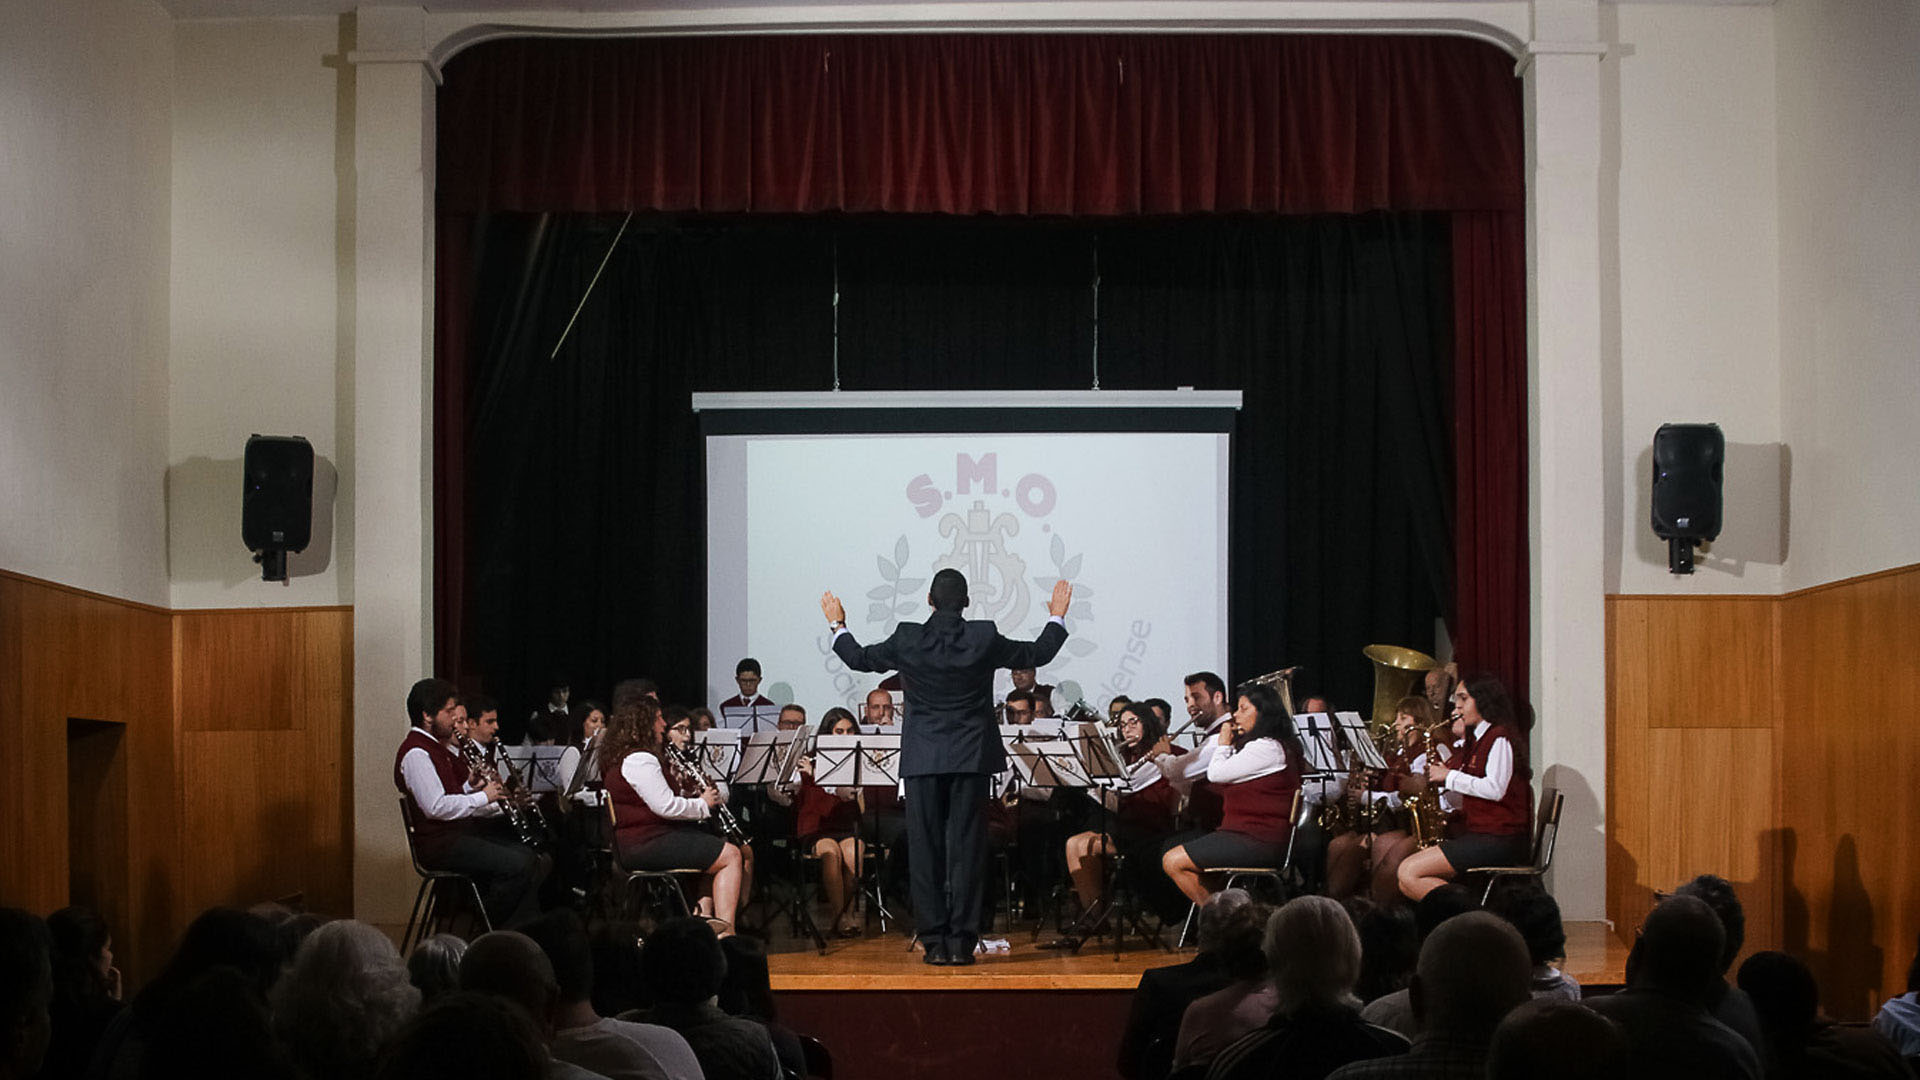 Banda da SMO - Concerto Primavera 2017 © Franca Franchi